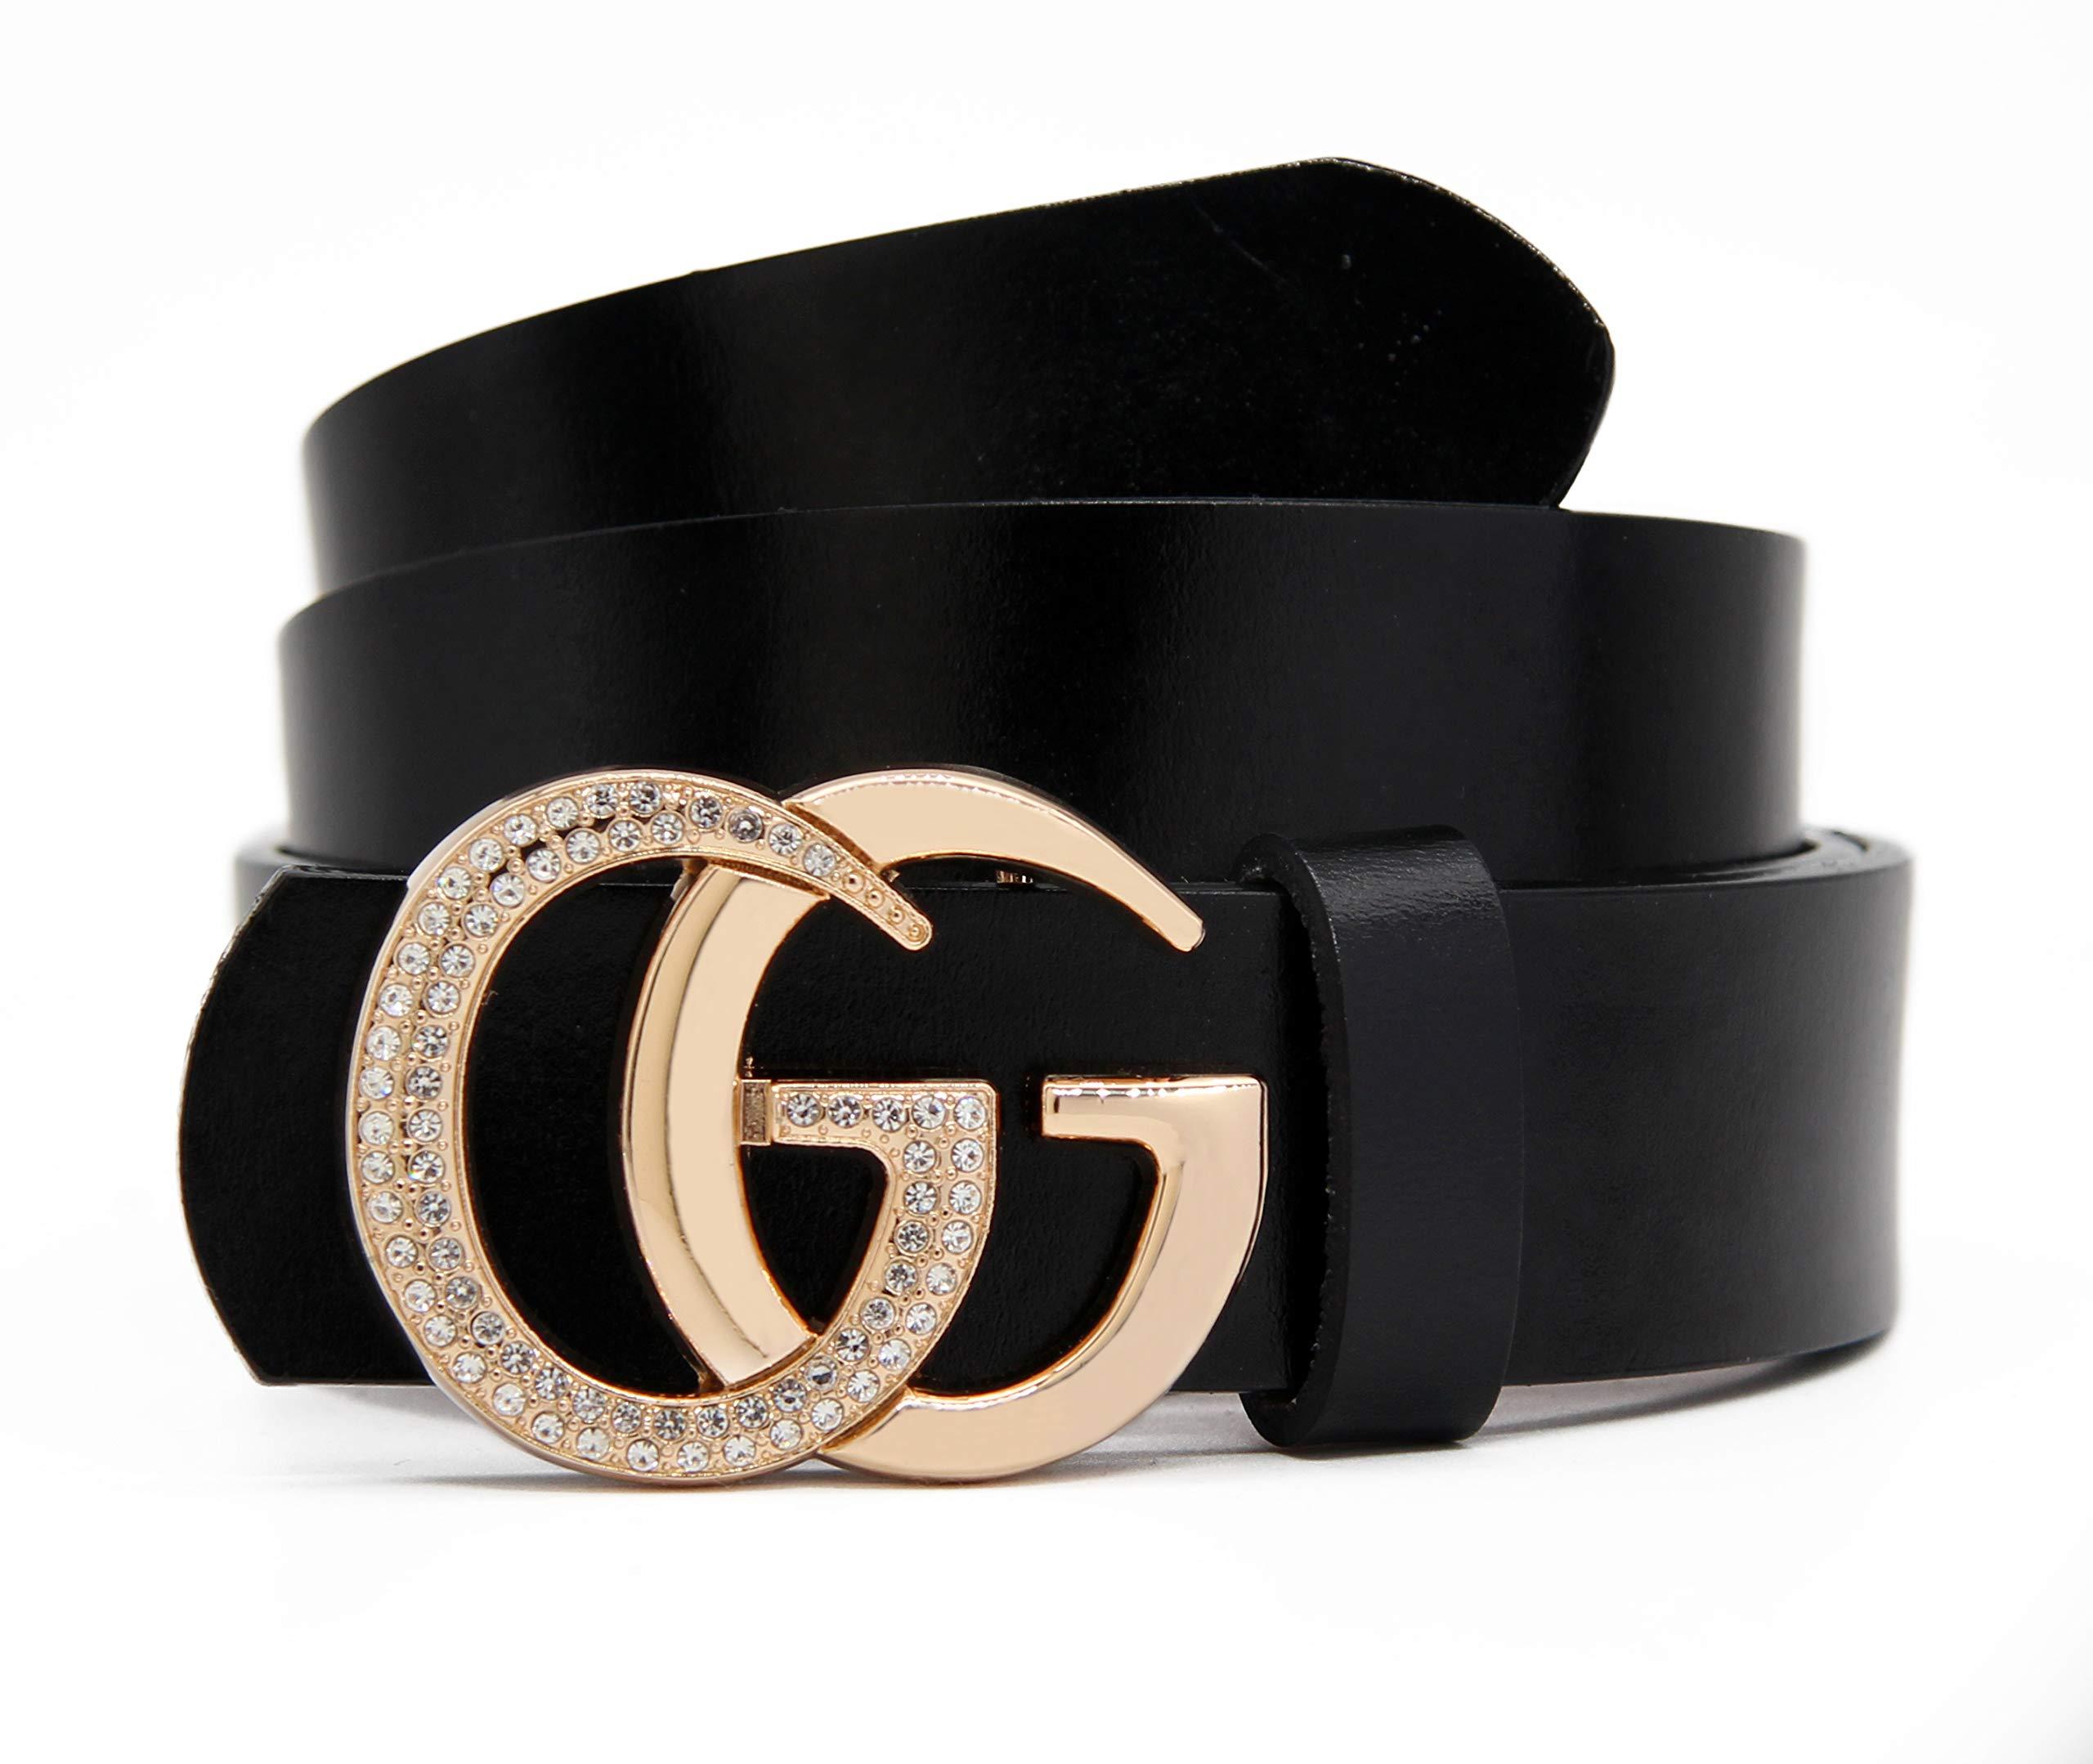 Women's Belts Cowhide Leather Belt Fashion Gold Zircon Buckle Gift Box By GAGOTE